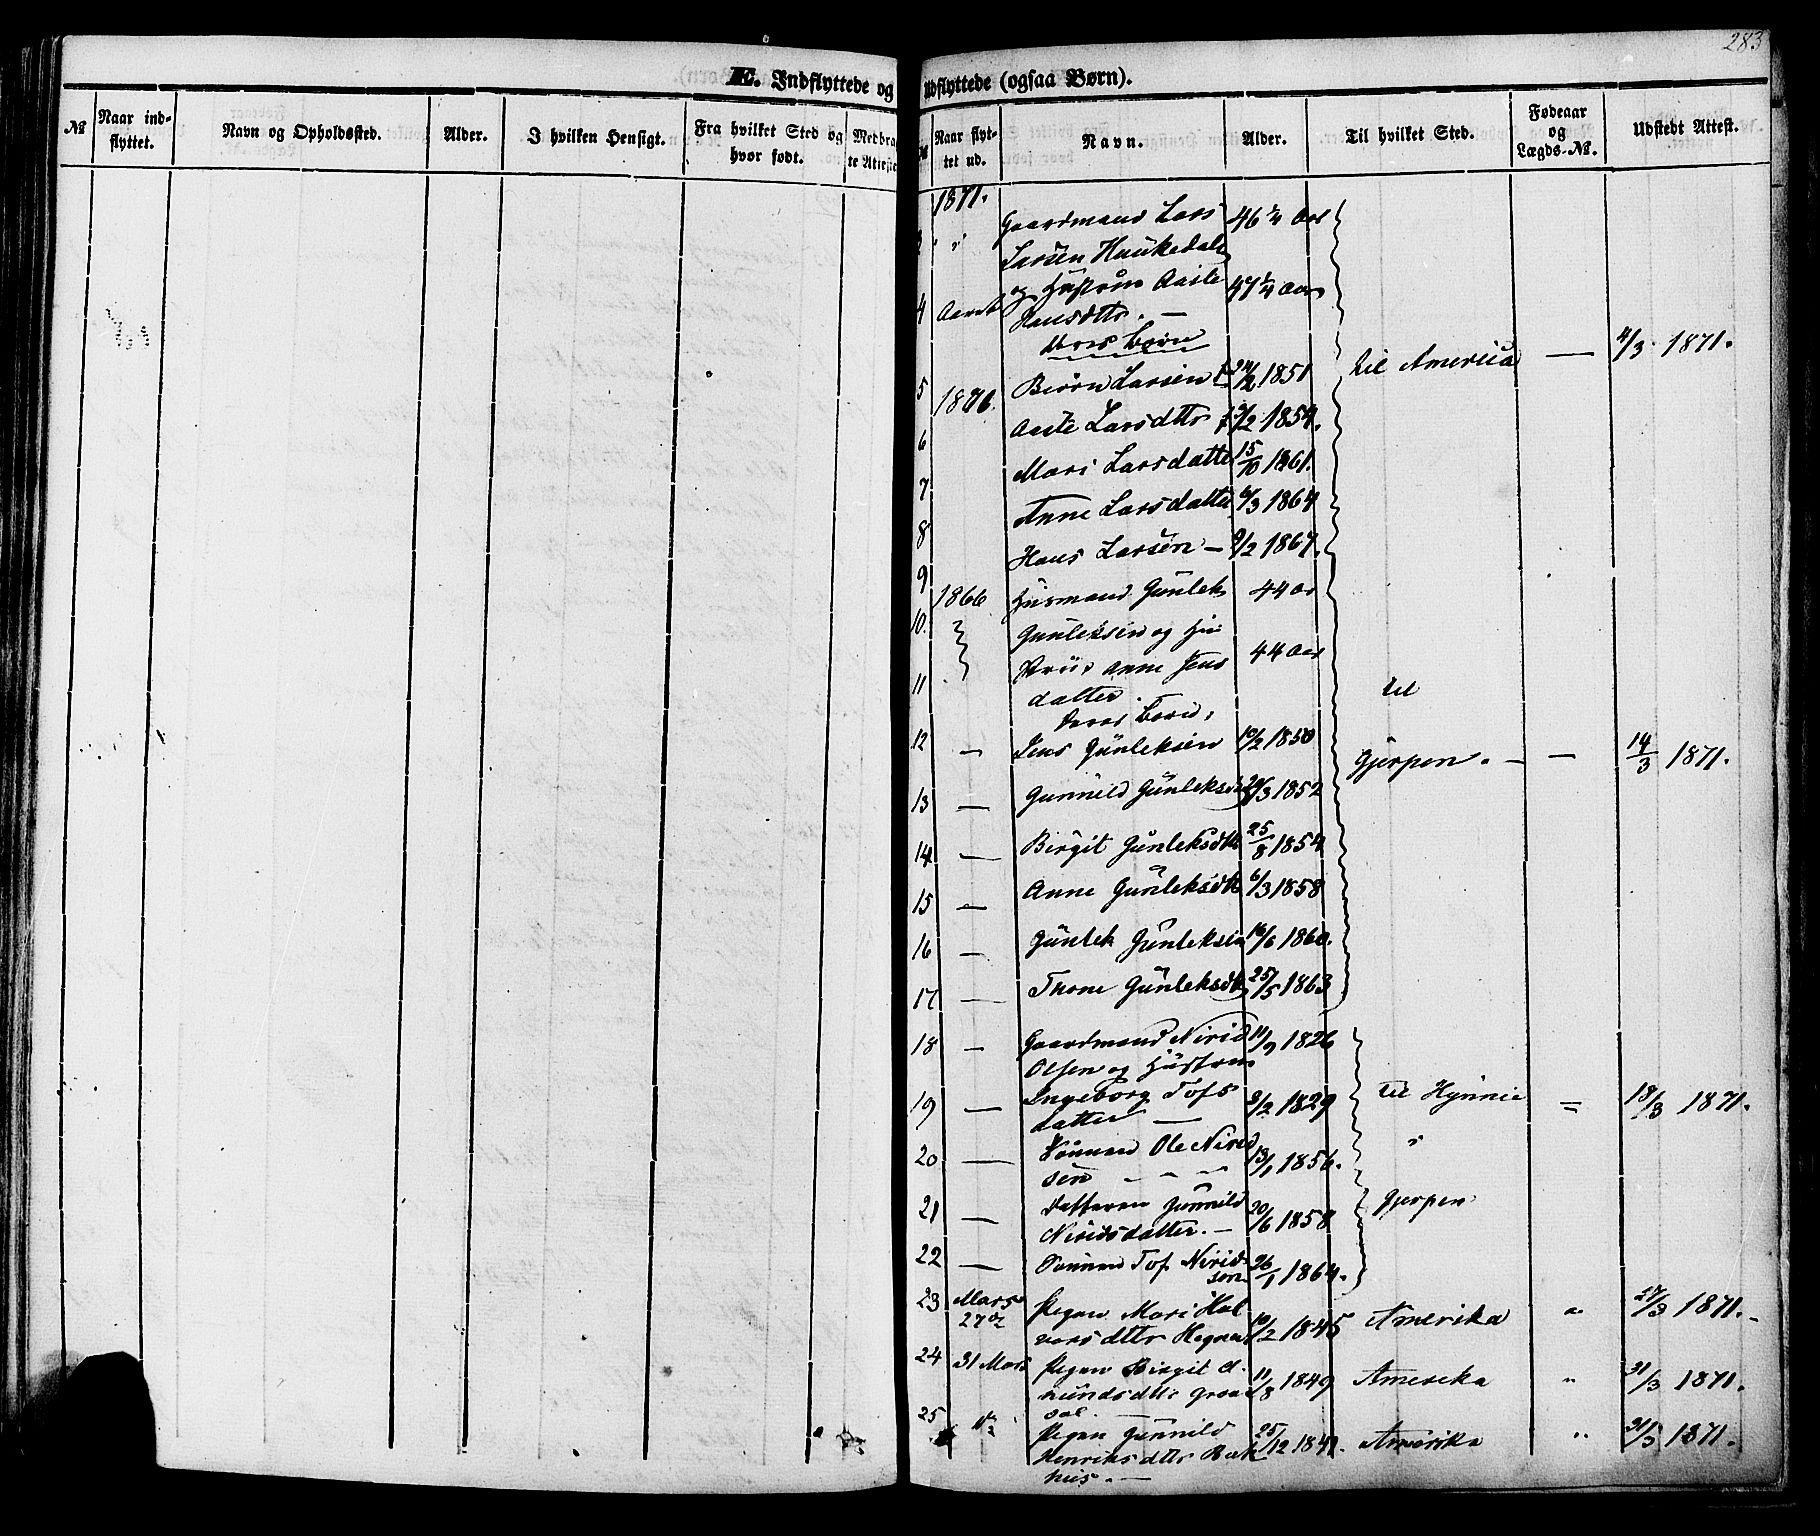 SAKO, Sauherad kirkebøker, F/Fa/L0007: Ministerialbok nr. I 7, 1851-1873, s. 283